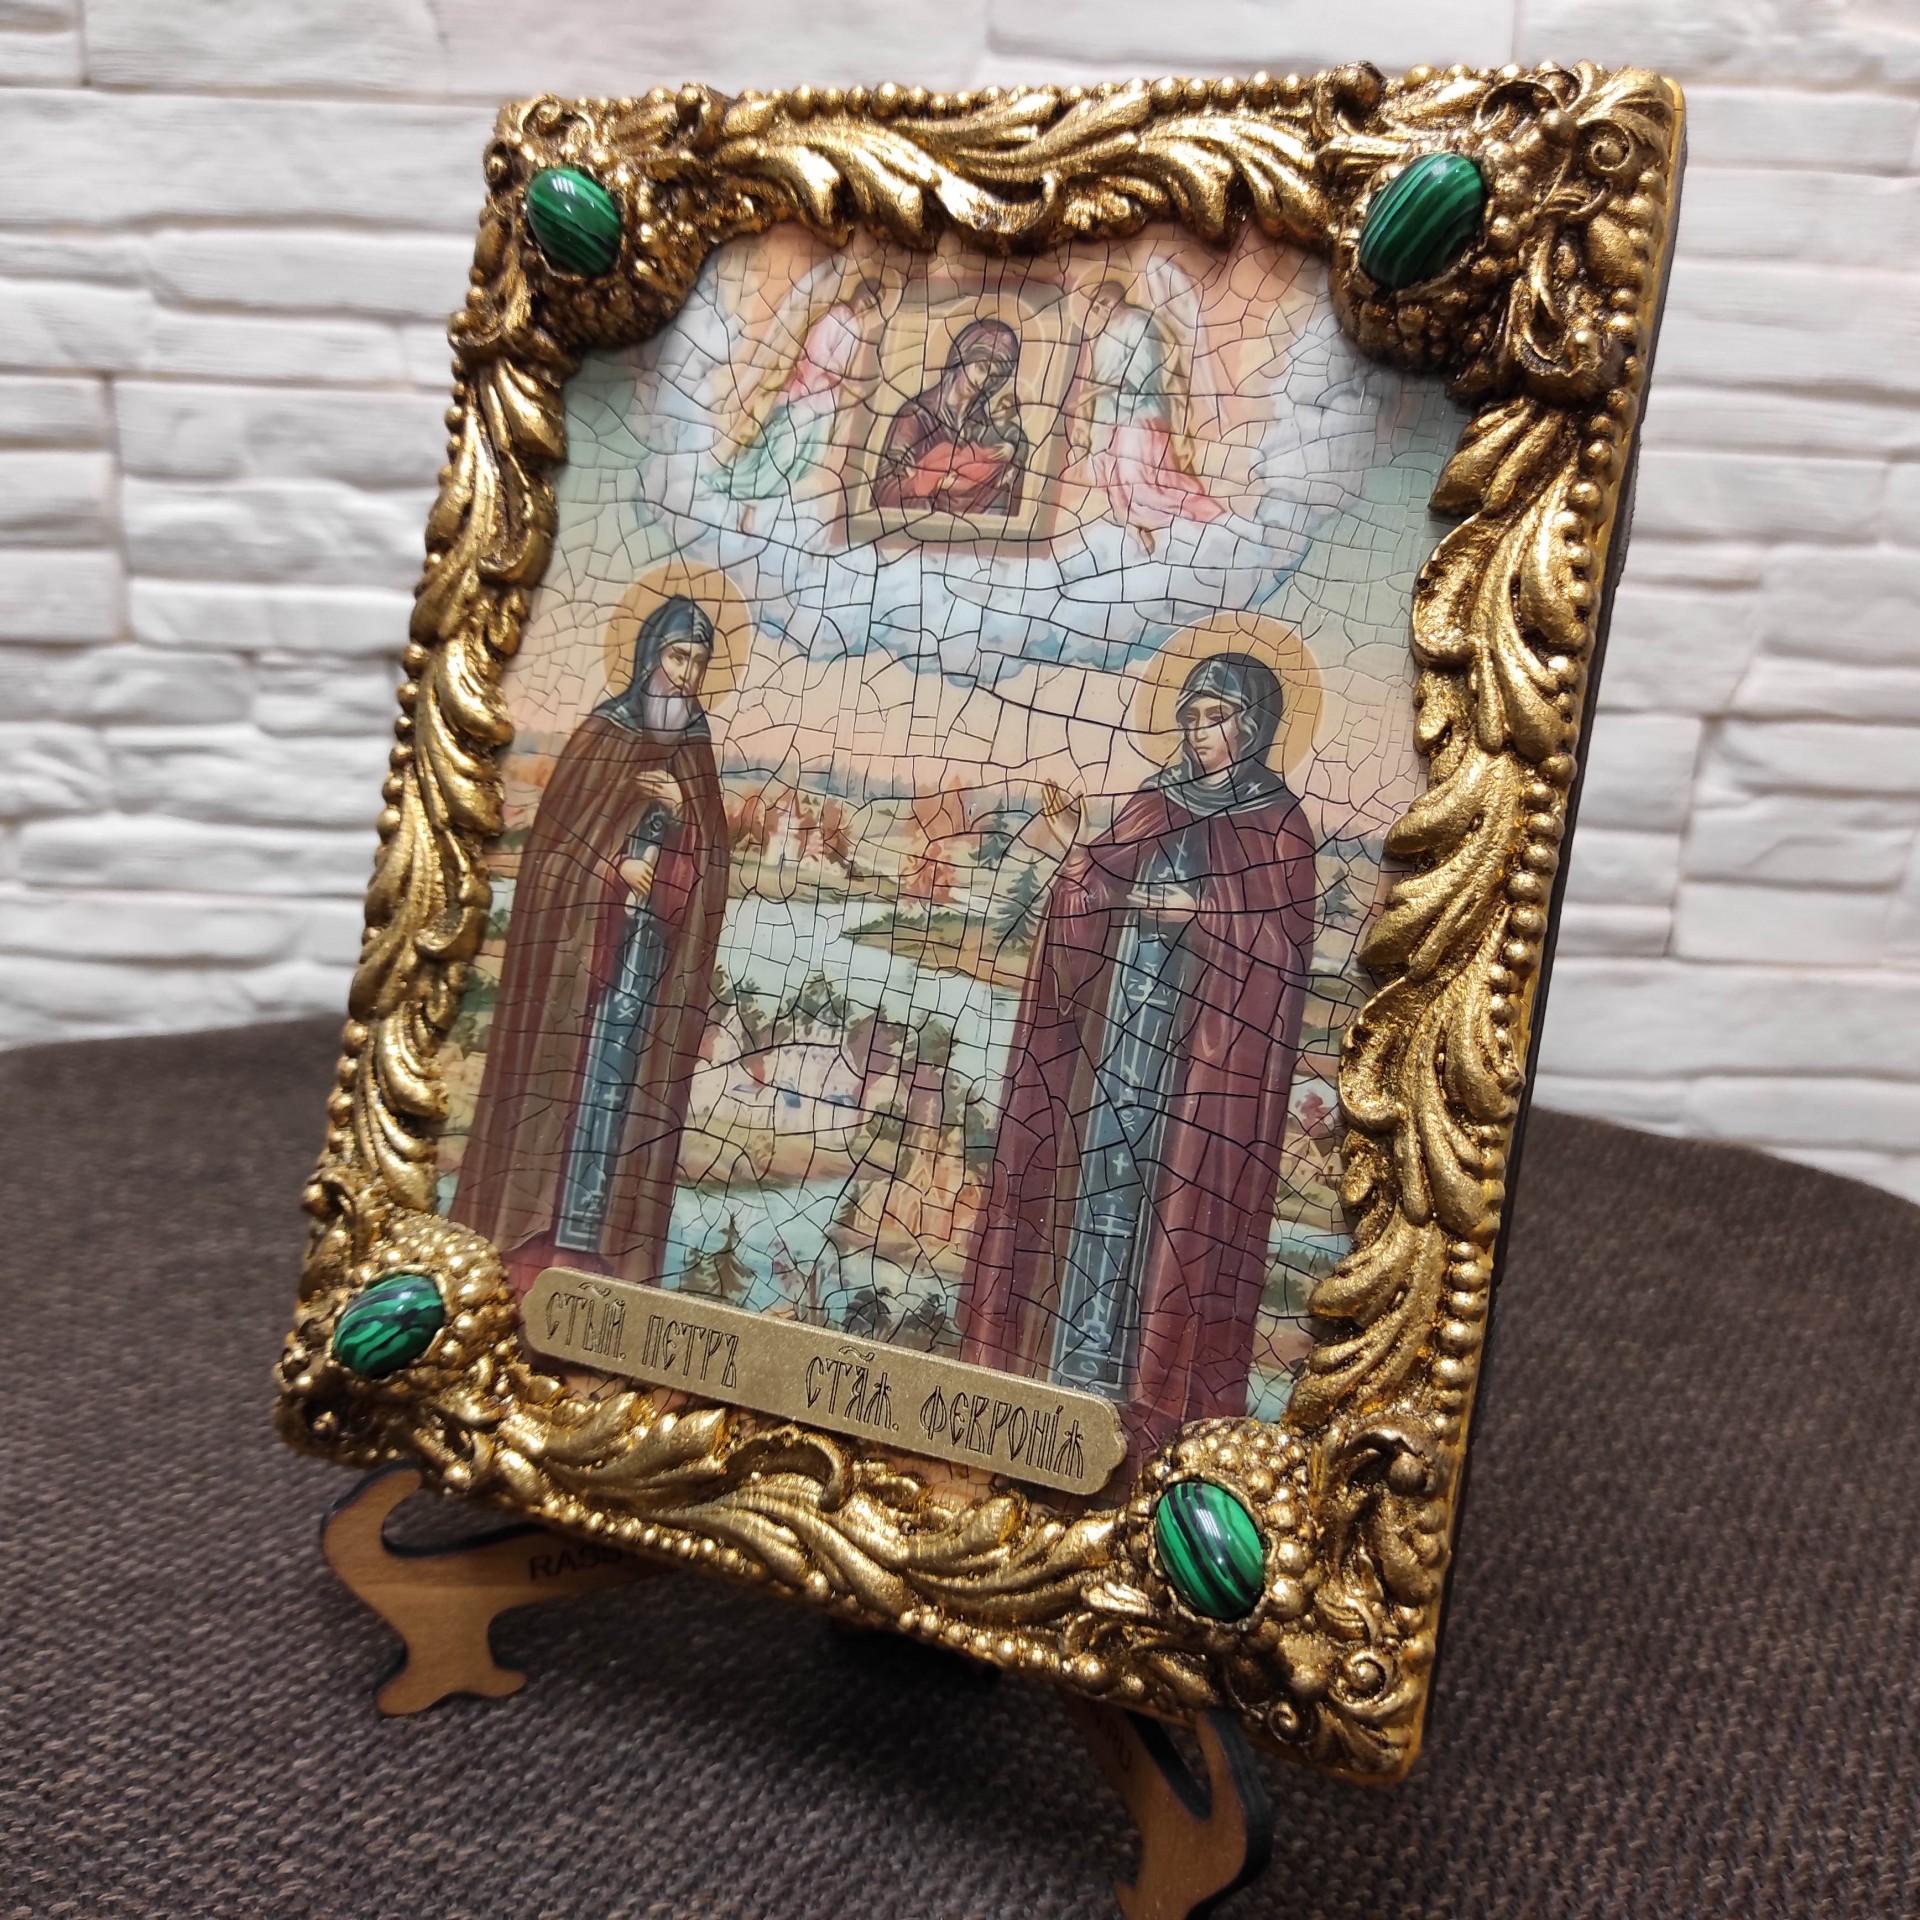 Фото иконы под старину Петра и Февронии с иглицами и зелеными камнями без футляра